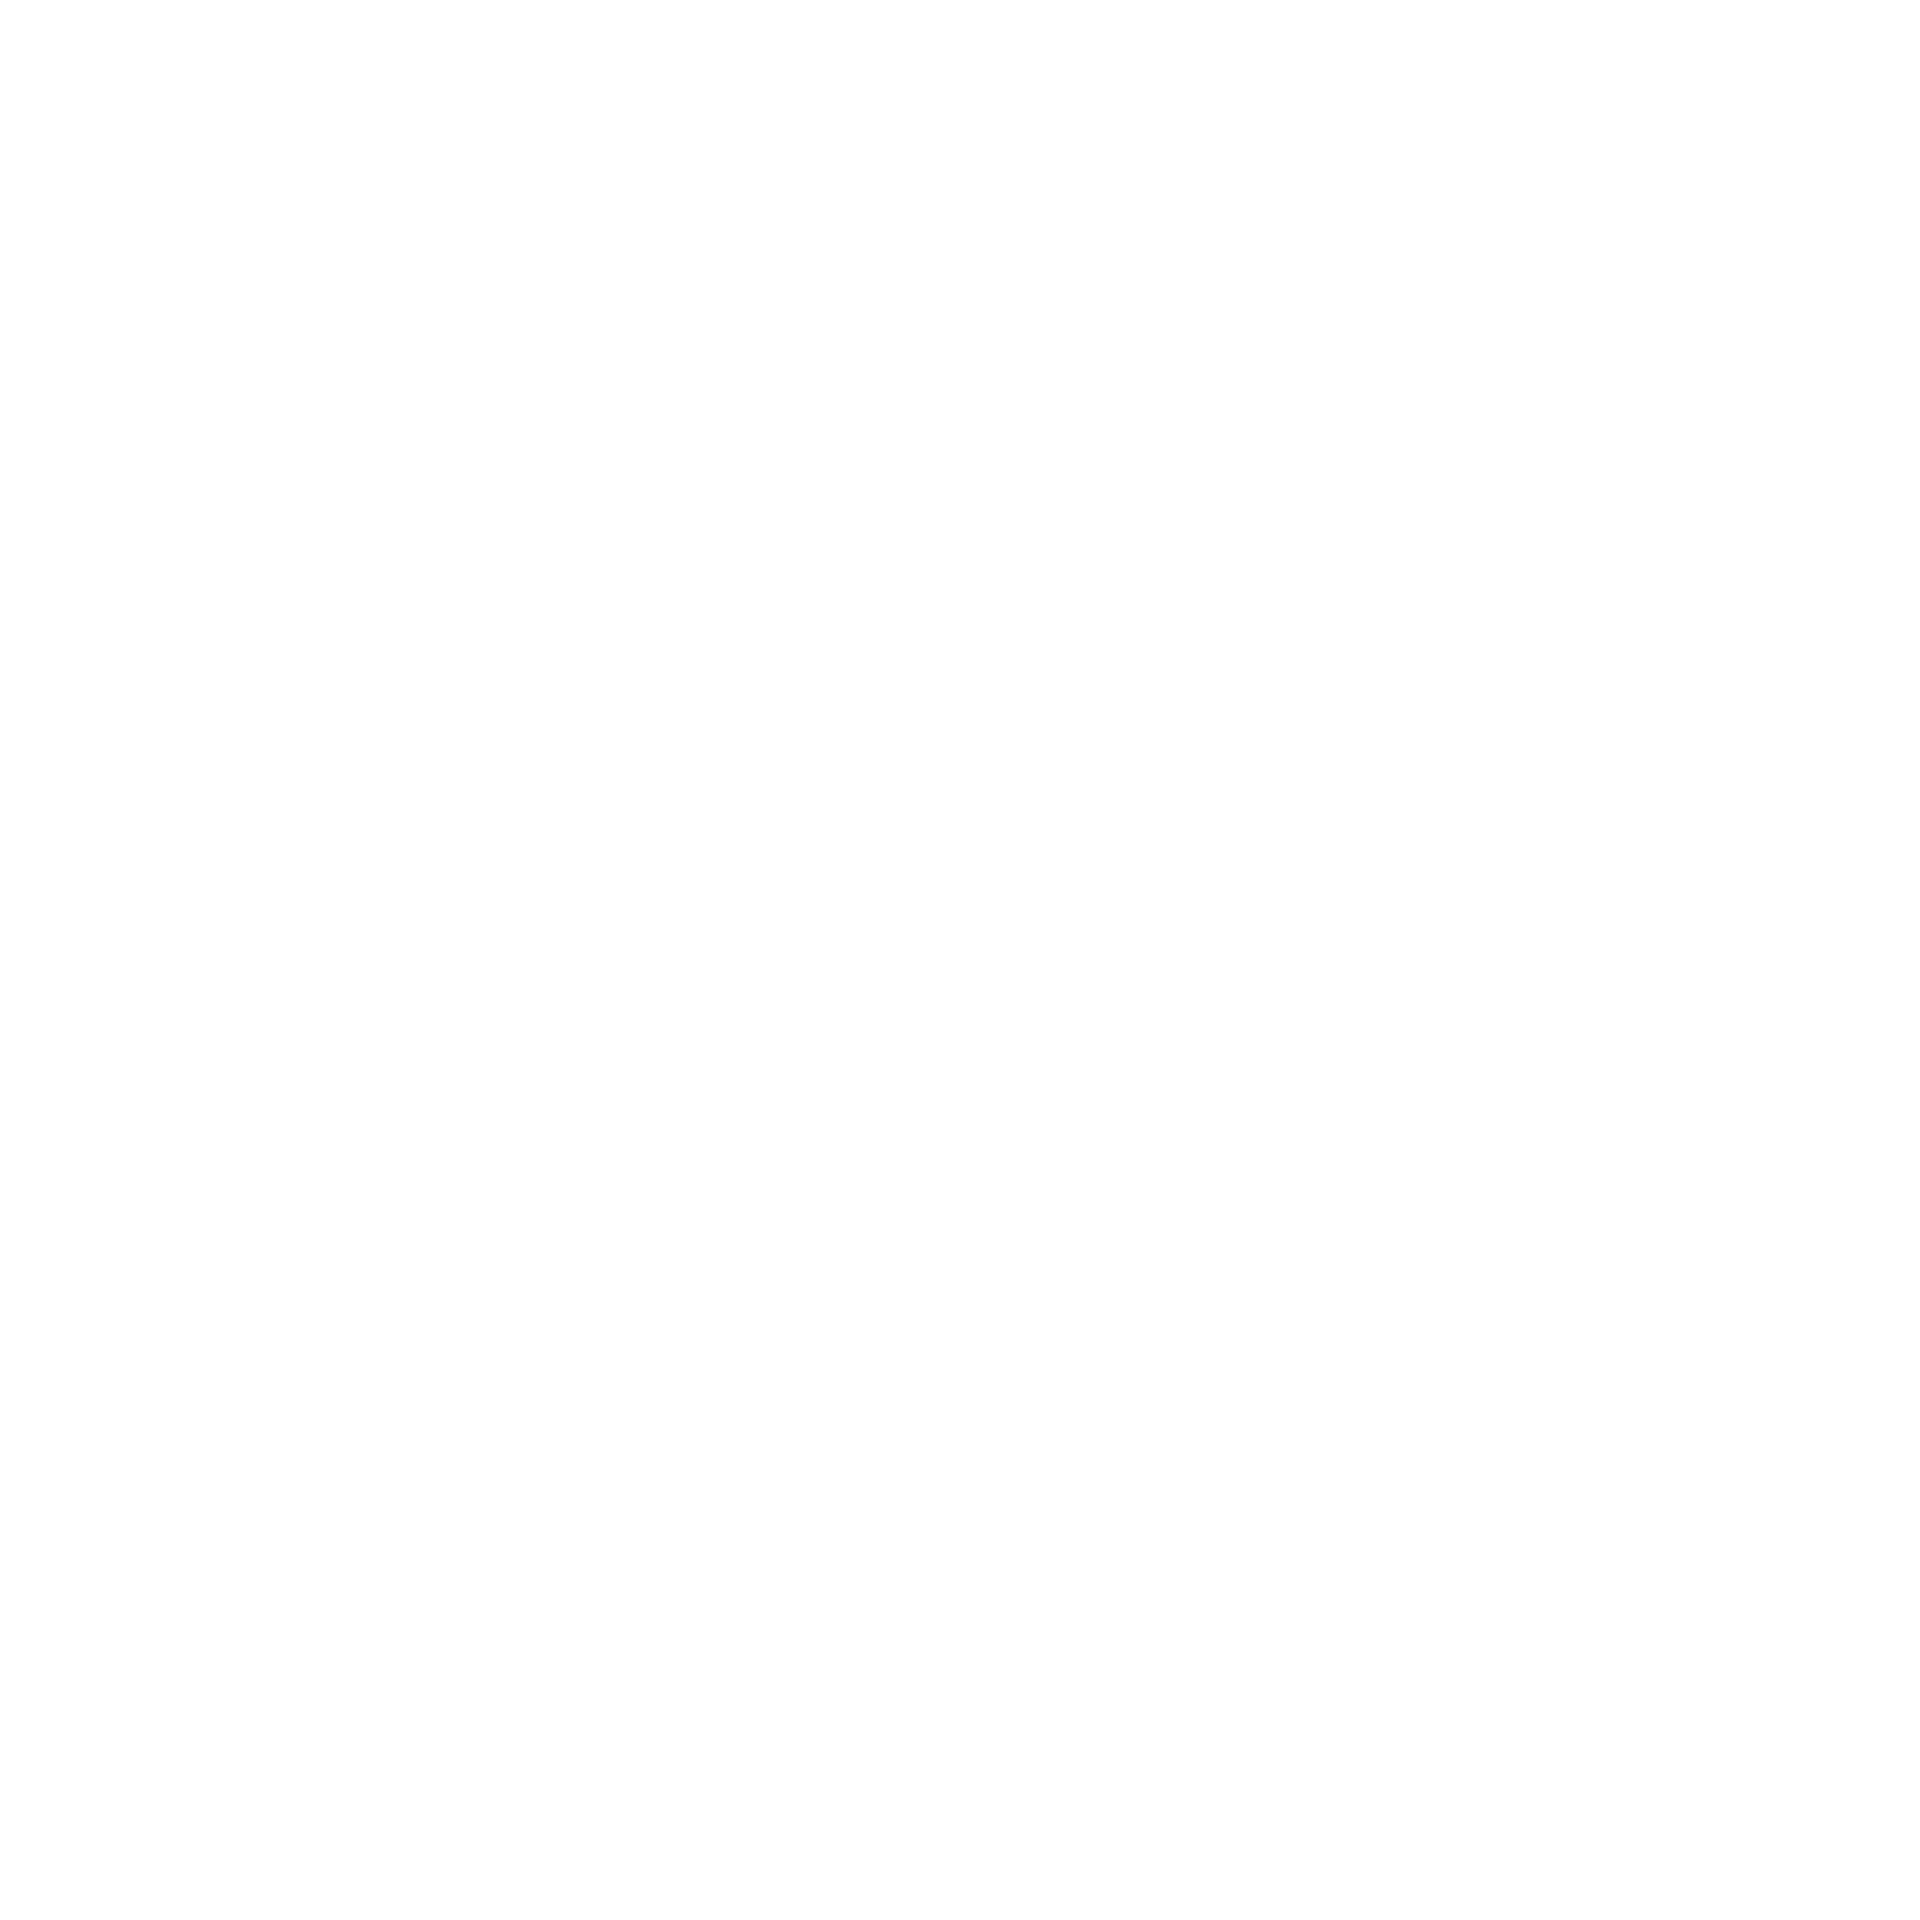 Energy Web brandmark